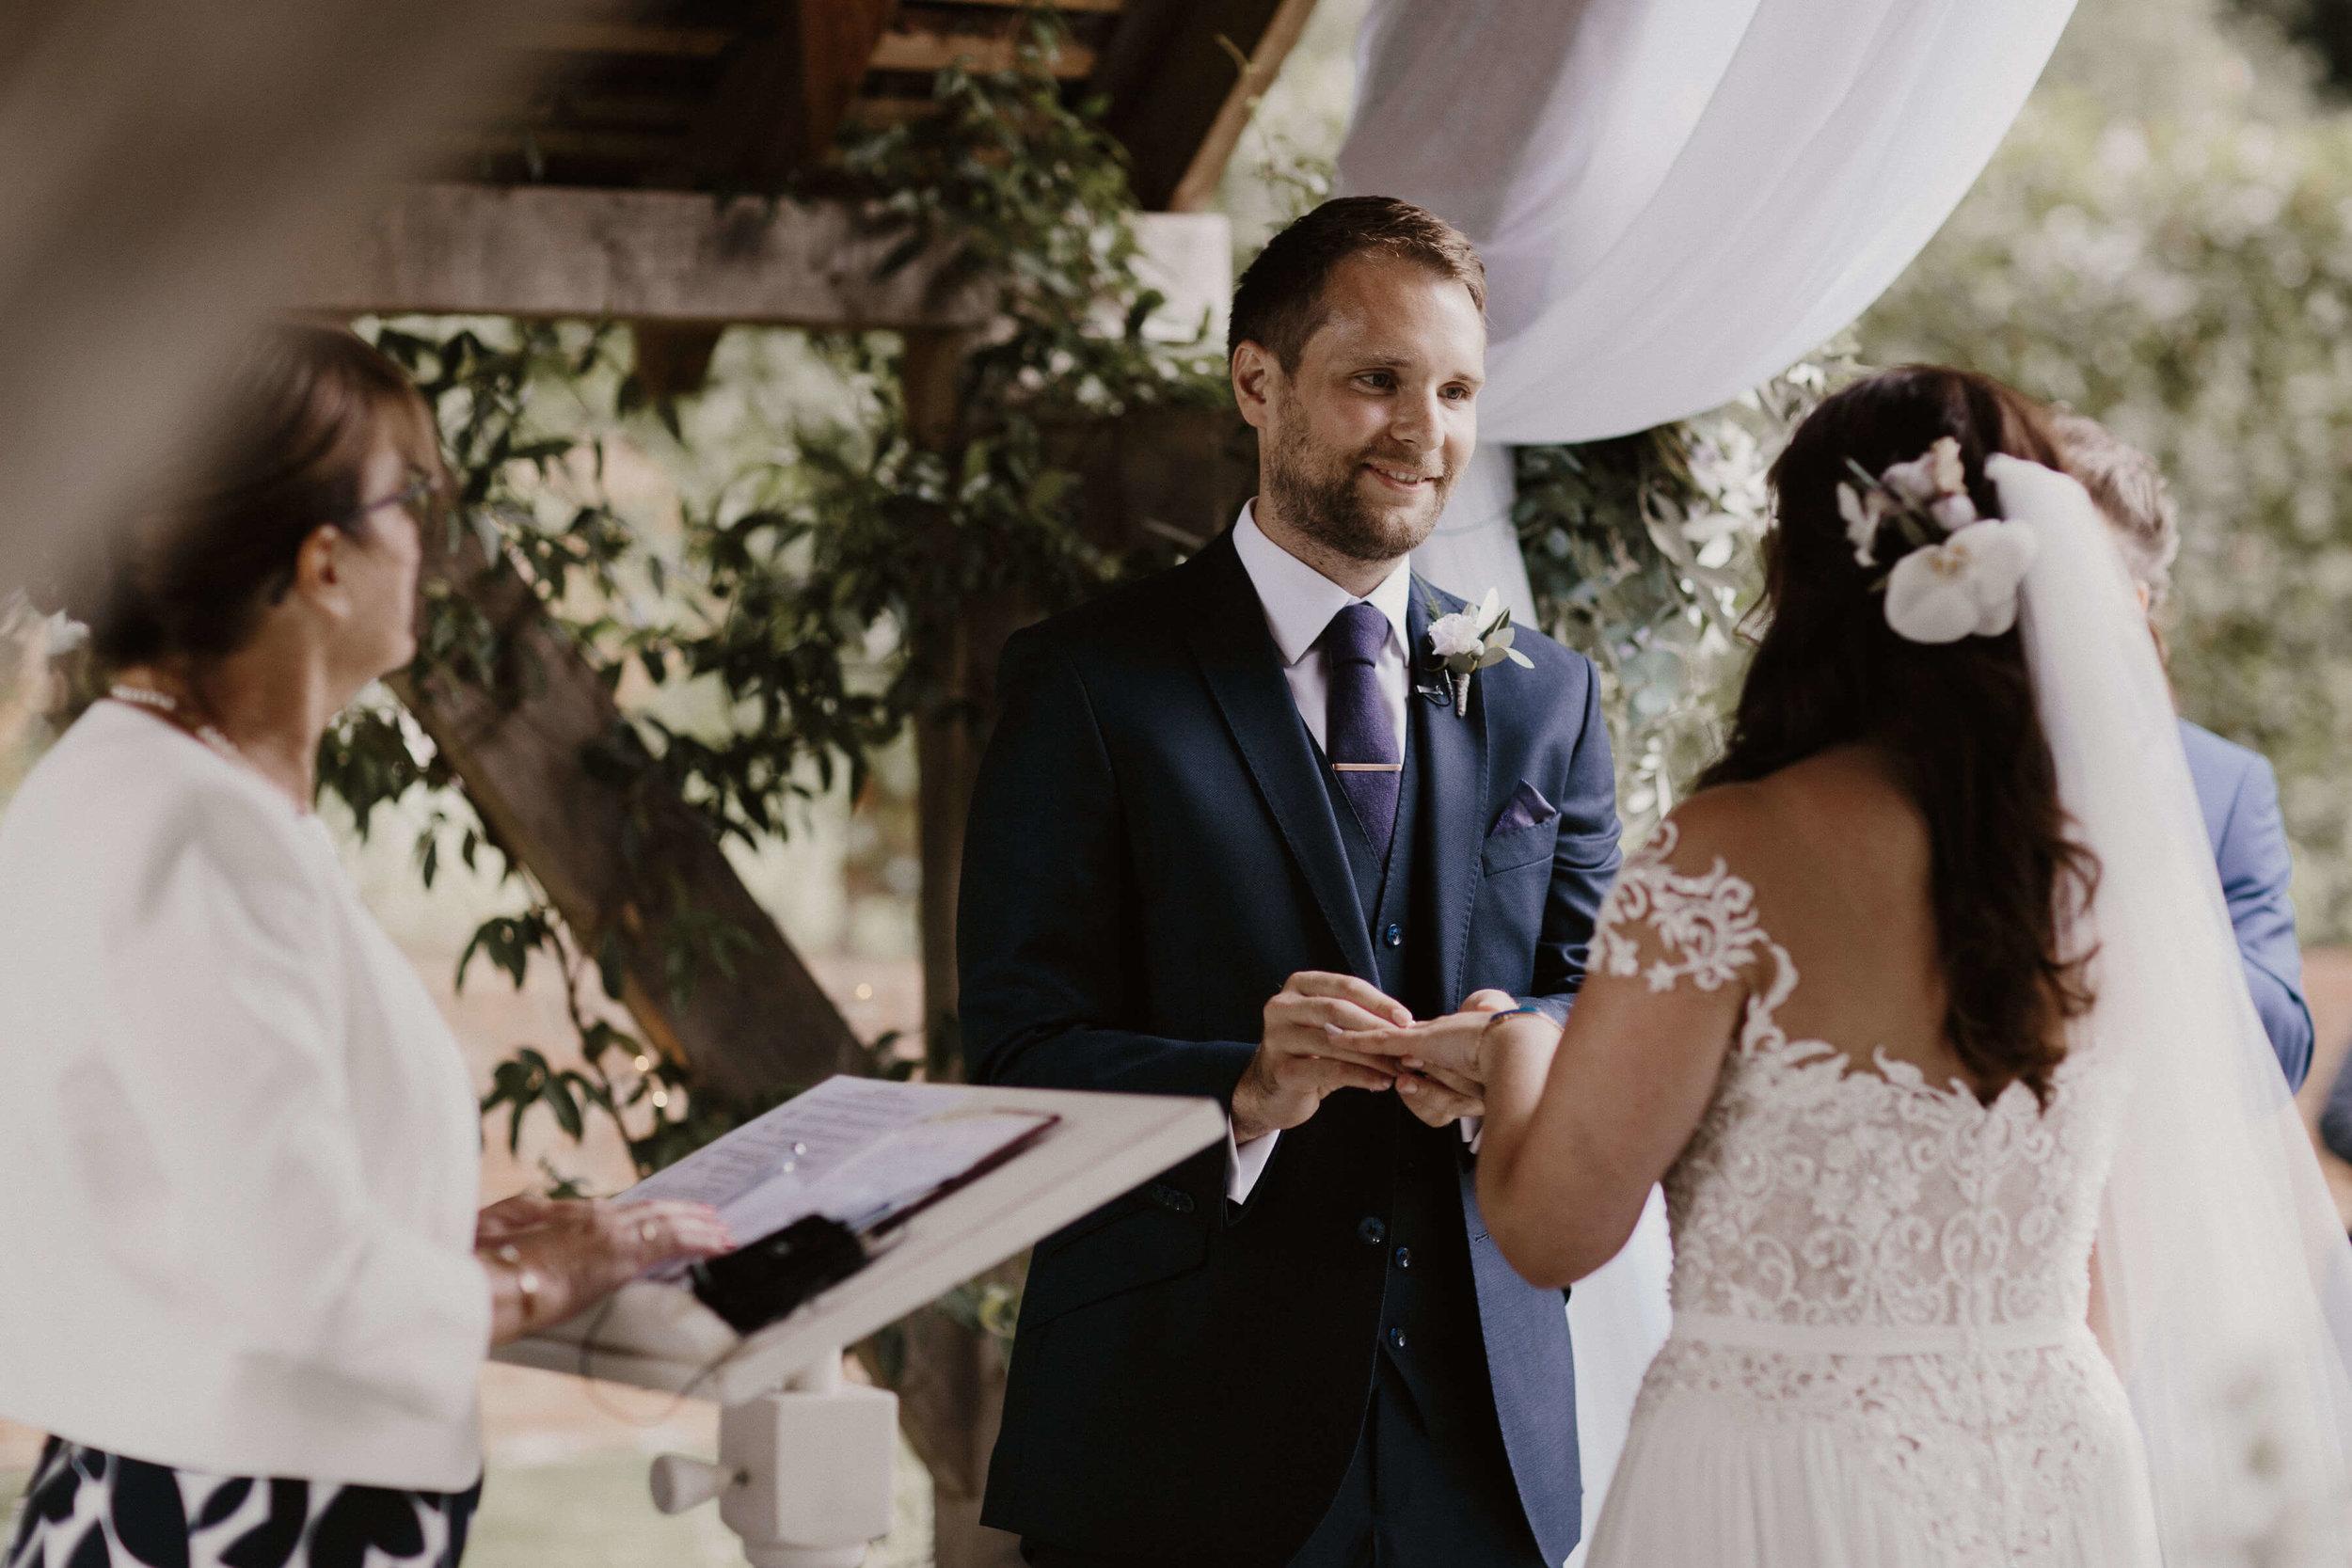 Nat and Tom - 05 - Ceremony - Sara Lincoln Photography-87.jpg